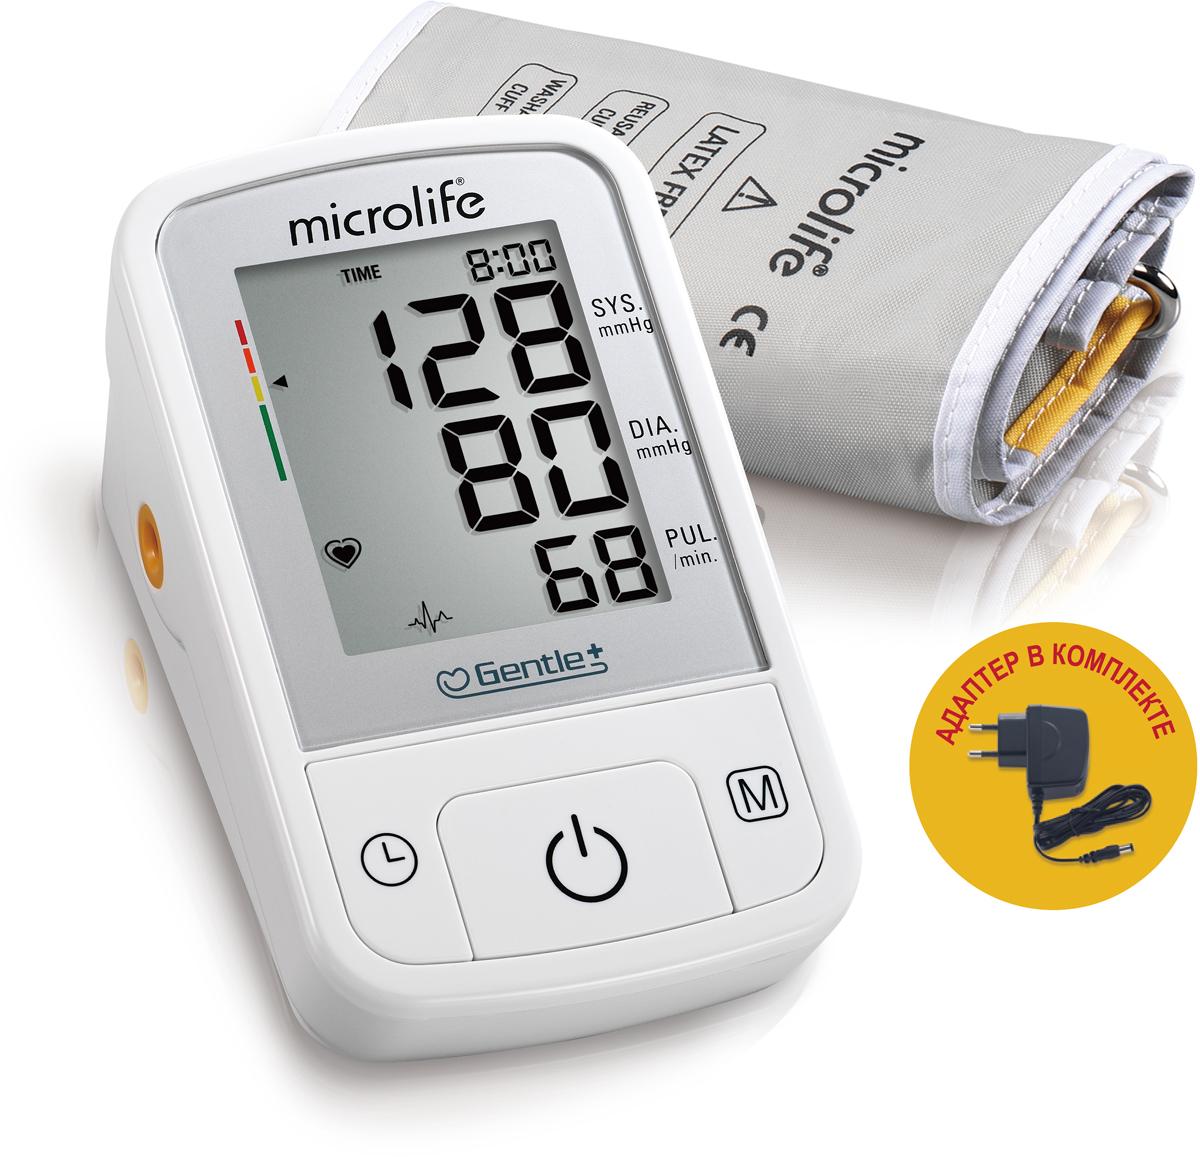 Microlife Тонометр автоматический BP A2 Basic с адаптером microlife для тонометра m size